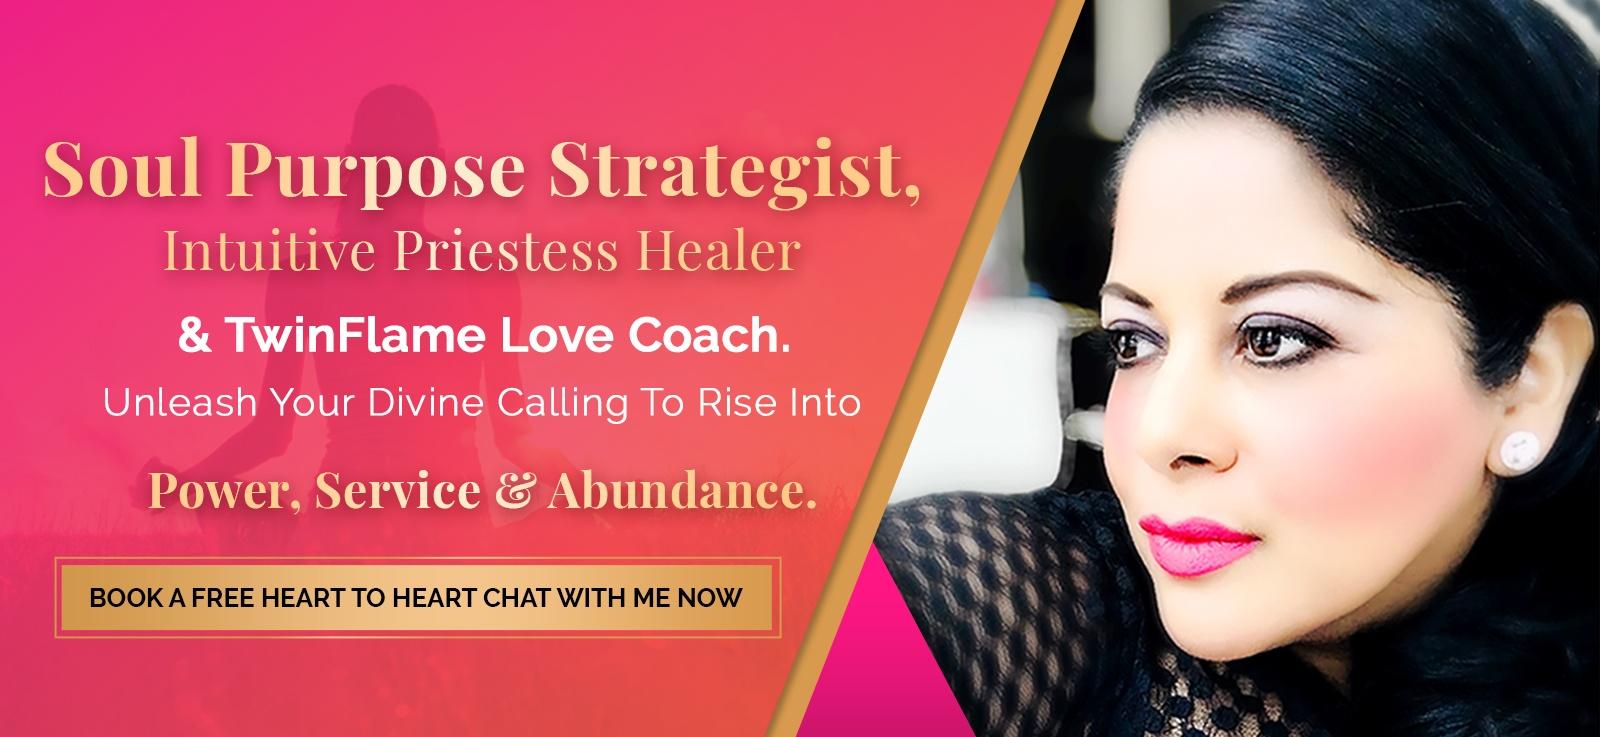 Hanah Ahmed | Soul Purpose Strategist | Intuitive Priestess Healer